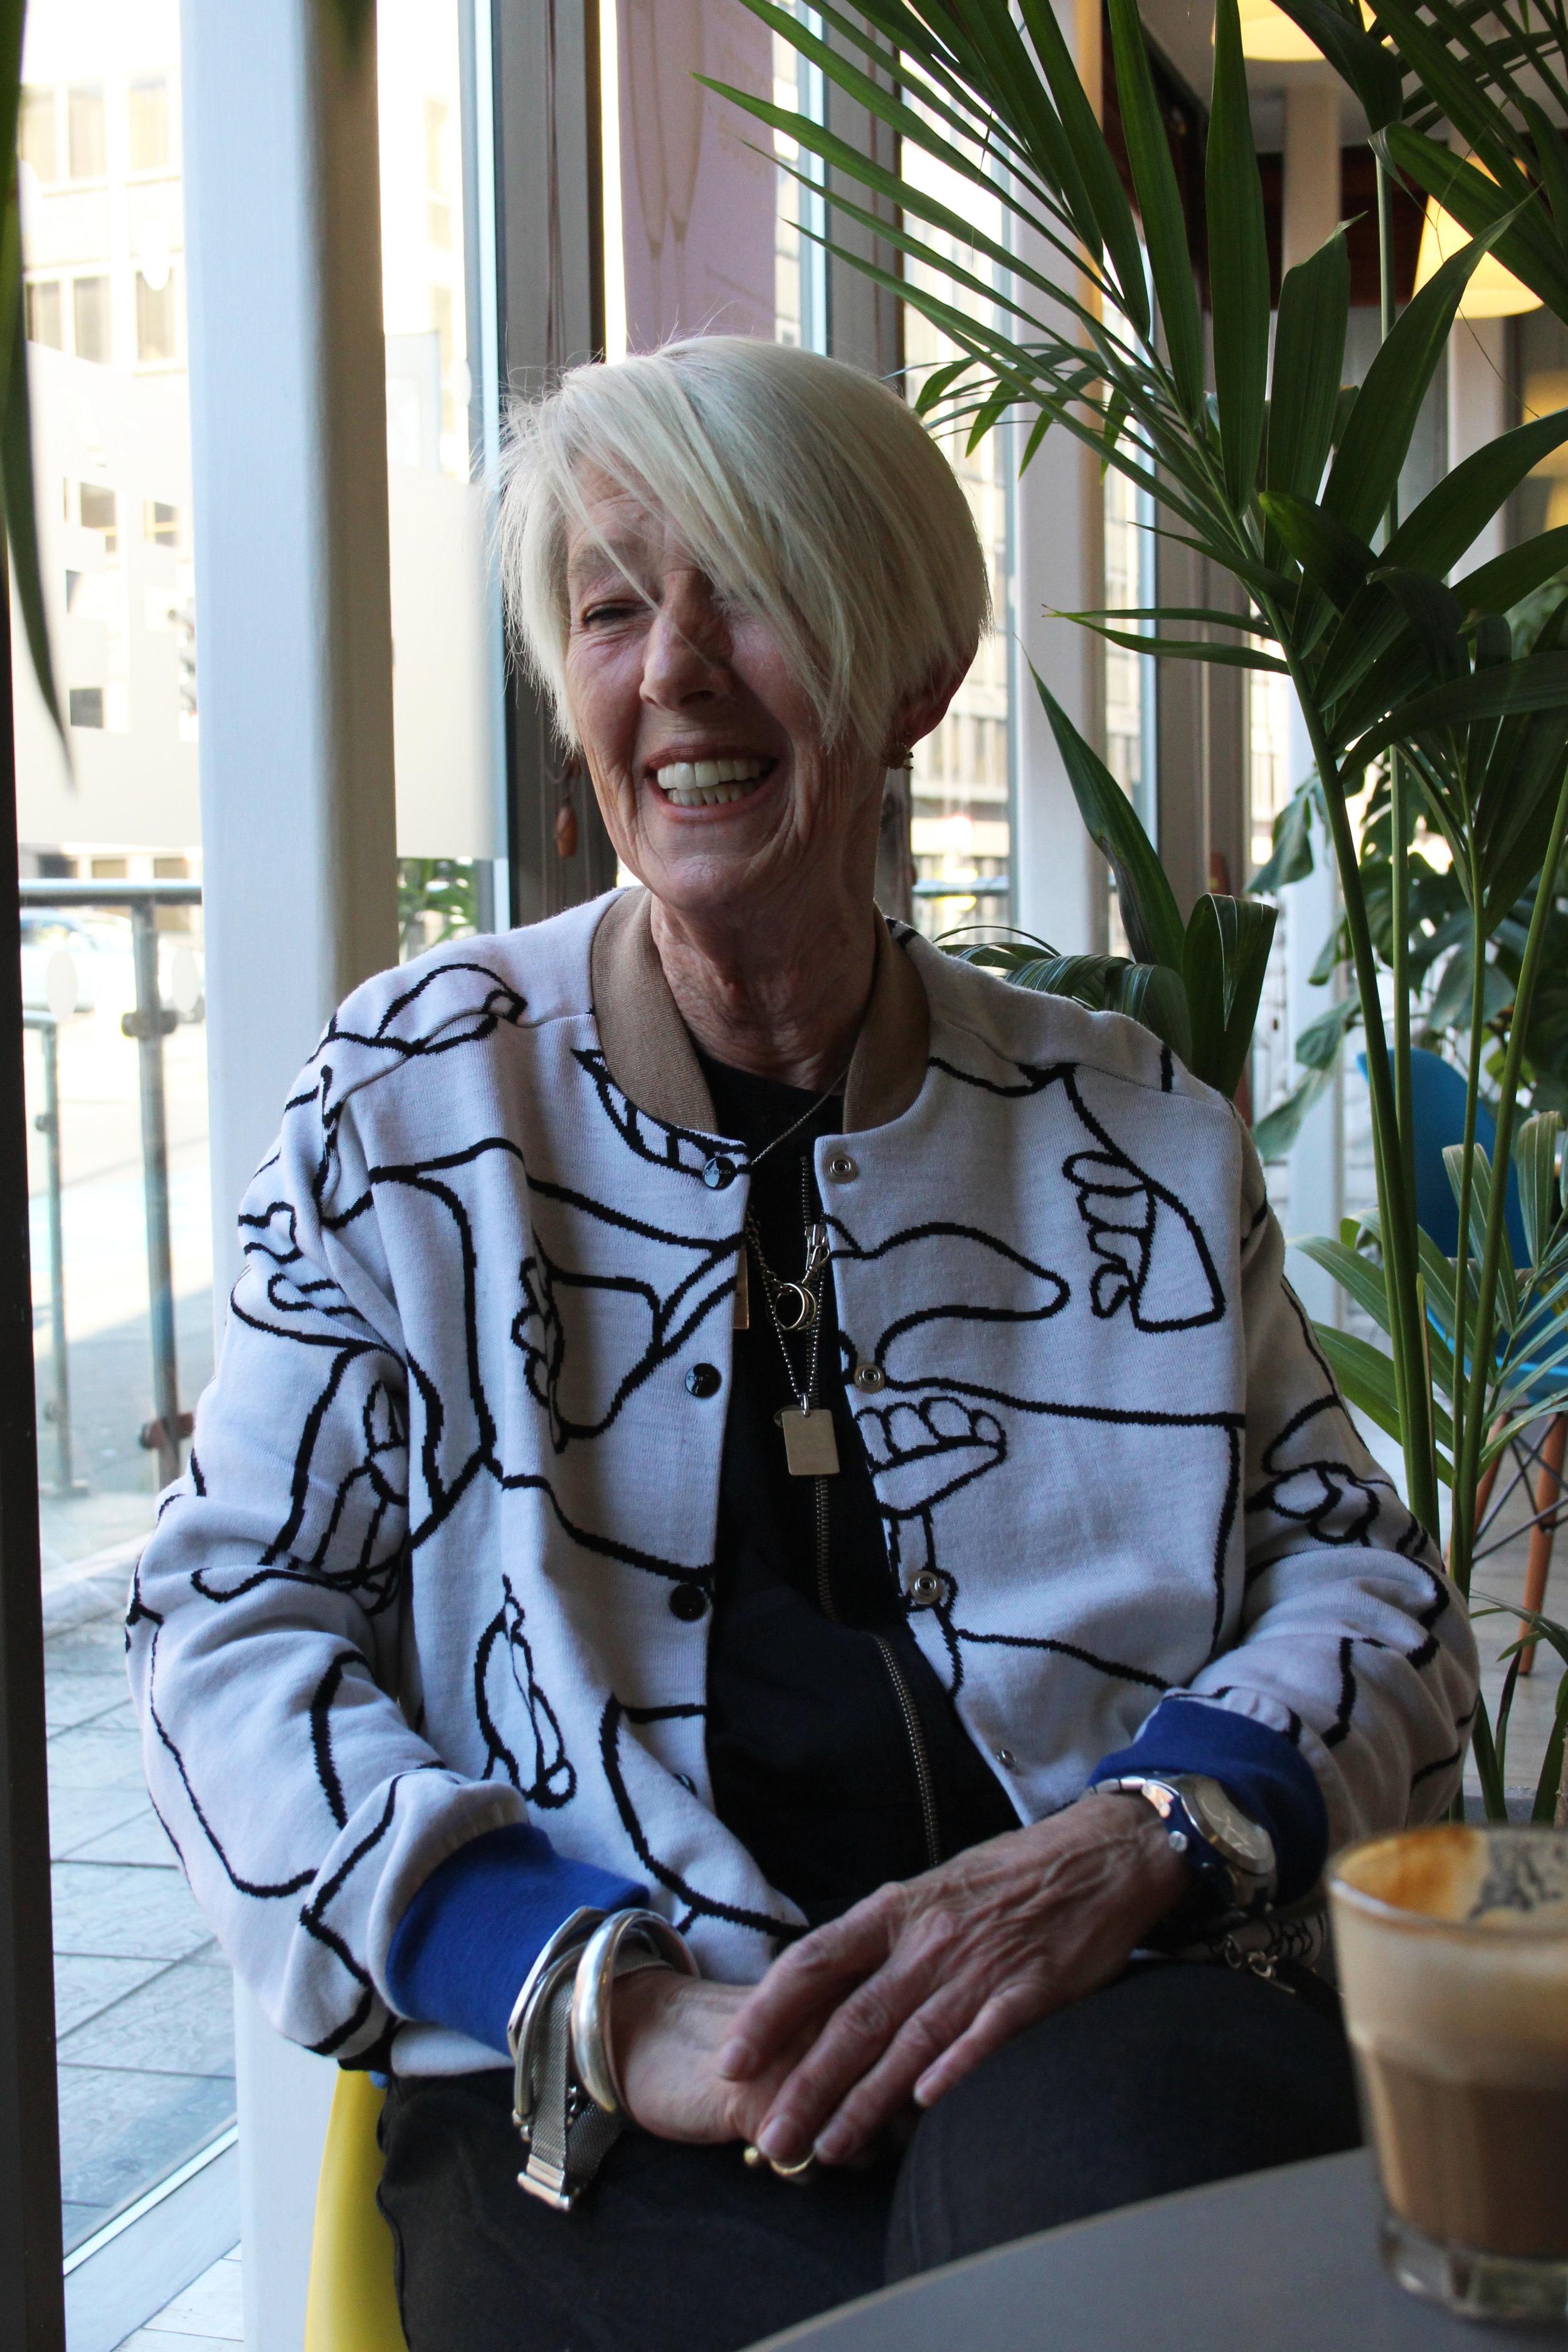 CEO interviewed women in business